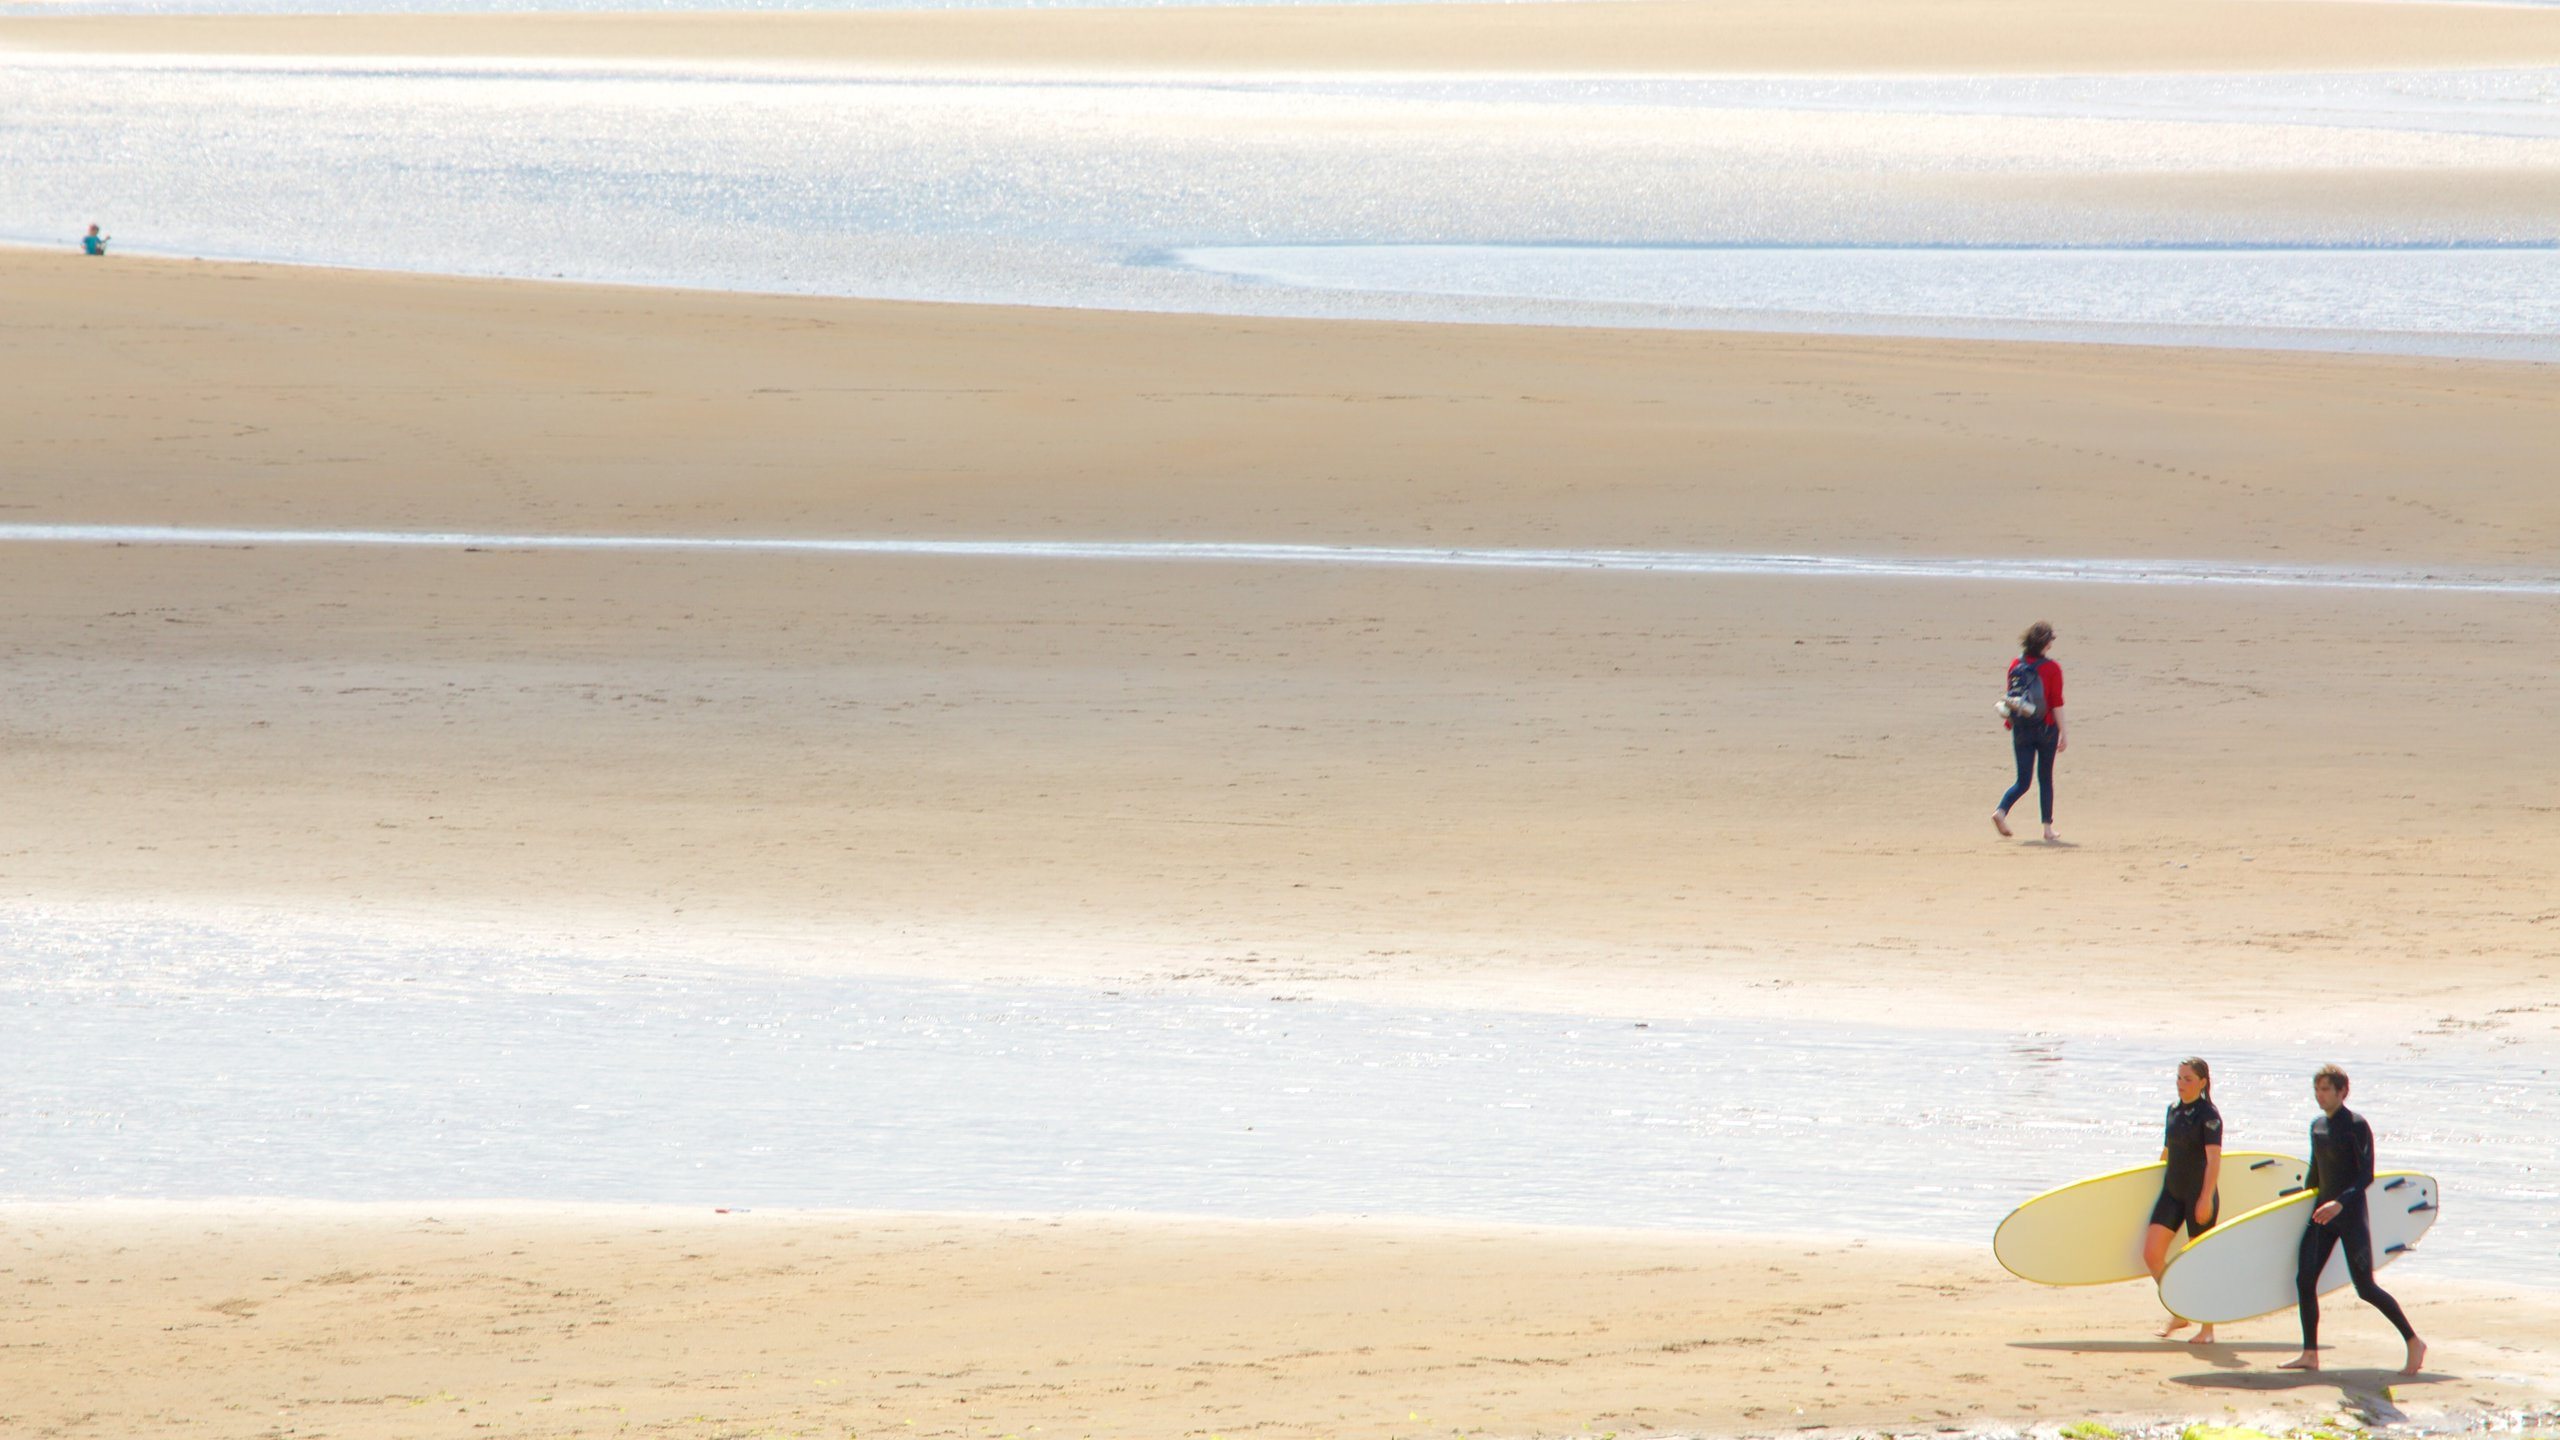 Strandhill Beach, Strandhill, County Sligo, Ireland